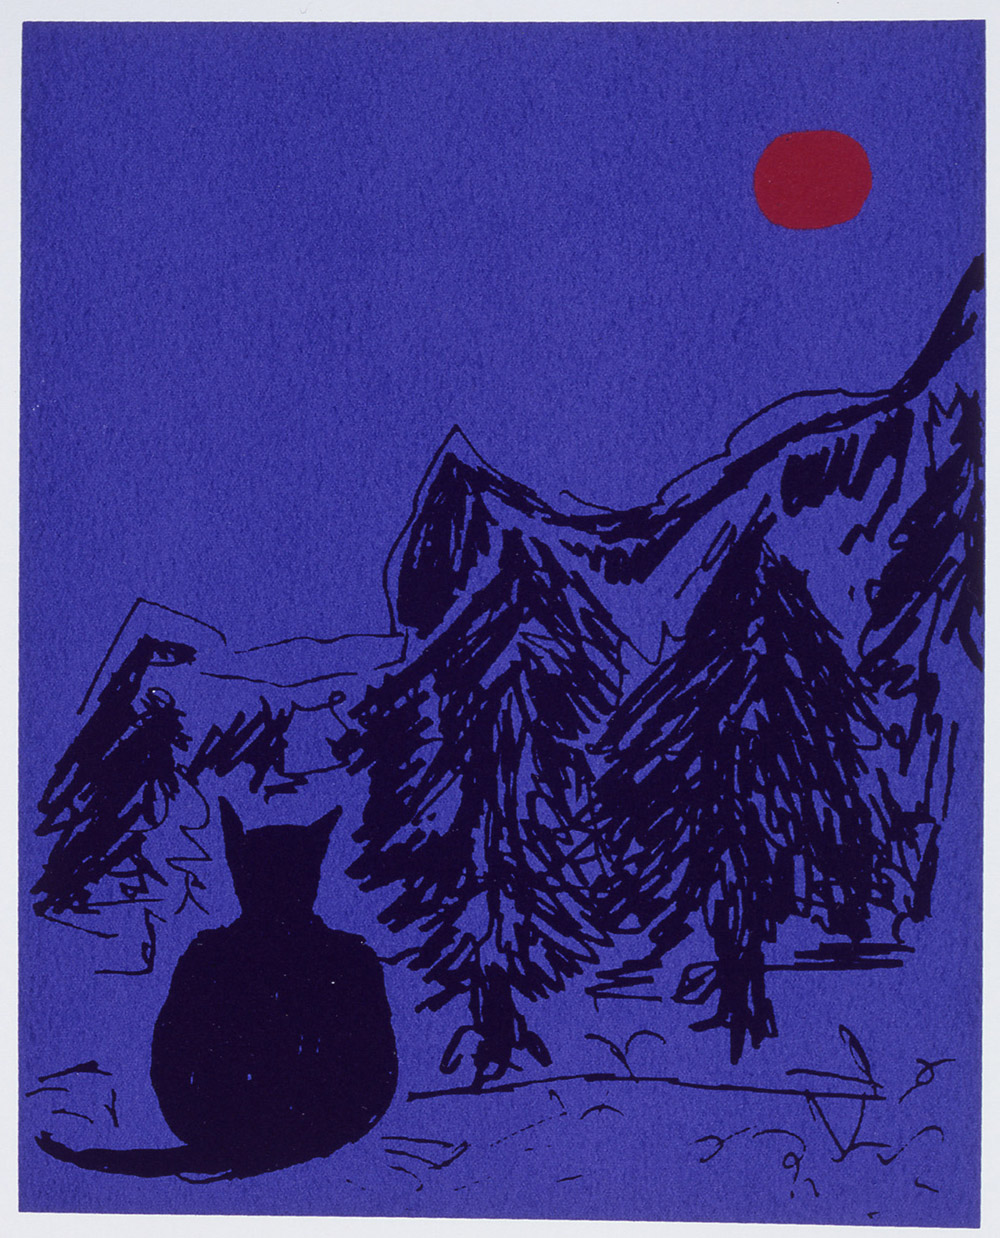 20.-Ono-Red-Moon-1995.-Screen-print-on-paper-20.3-x-15.2-cm-x.jpg